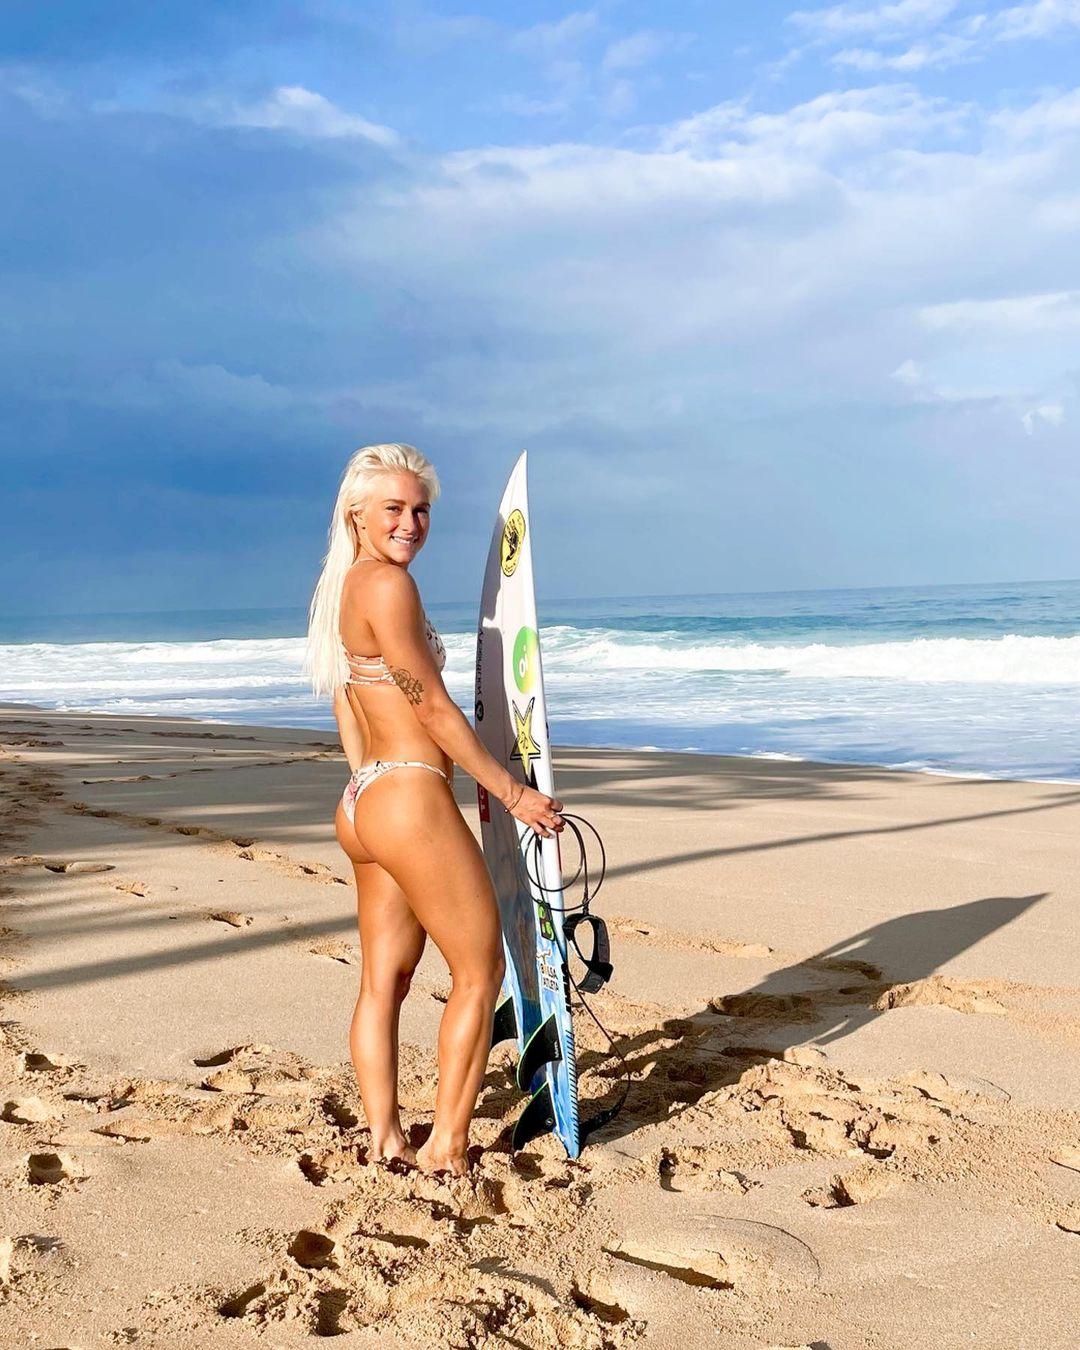 tatiana weston-webb bikini string thong ass margaret river pro surf 2021 wsl